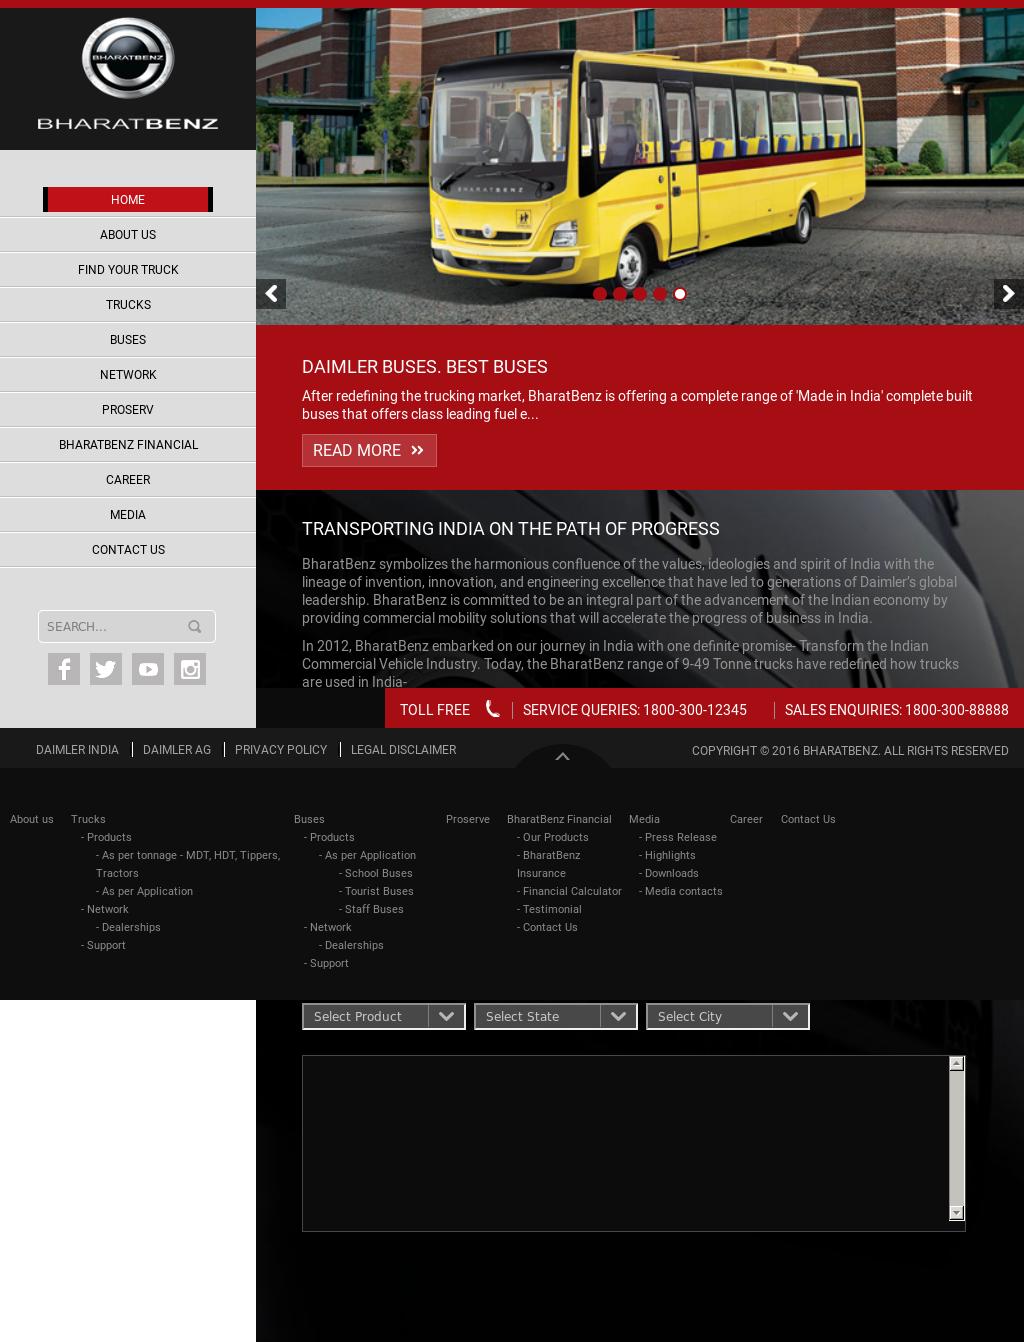 Career In Maruti Suzuki For Freshers